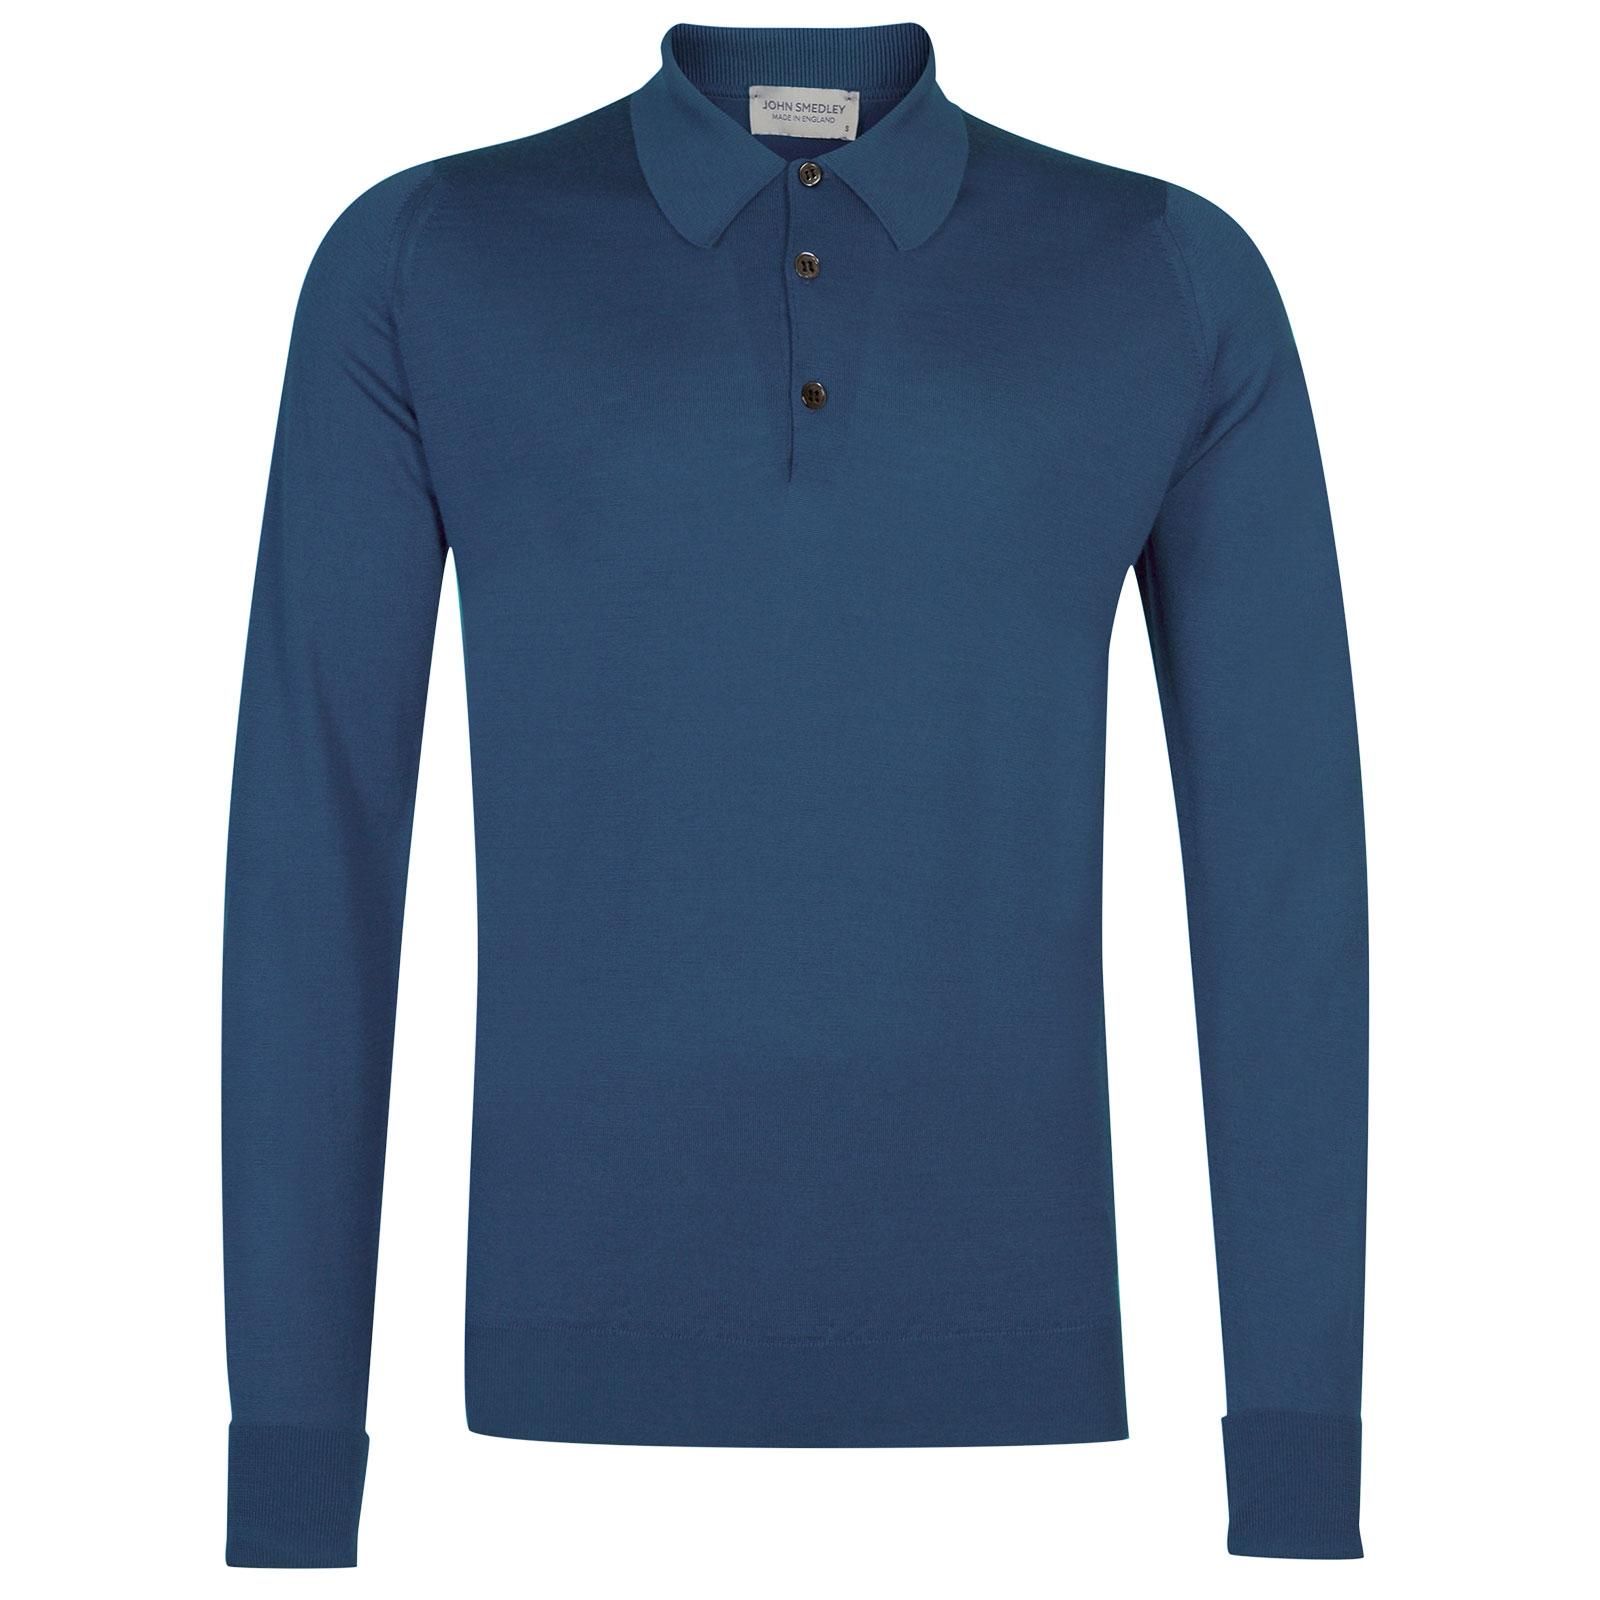 John Smedley dorset Merino Wool Shirt in Derwent Blue-S